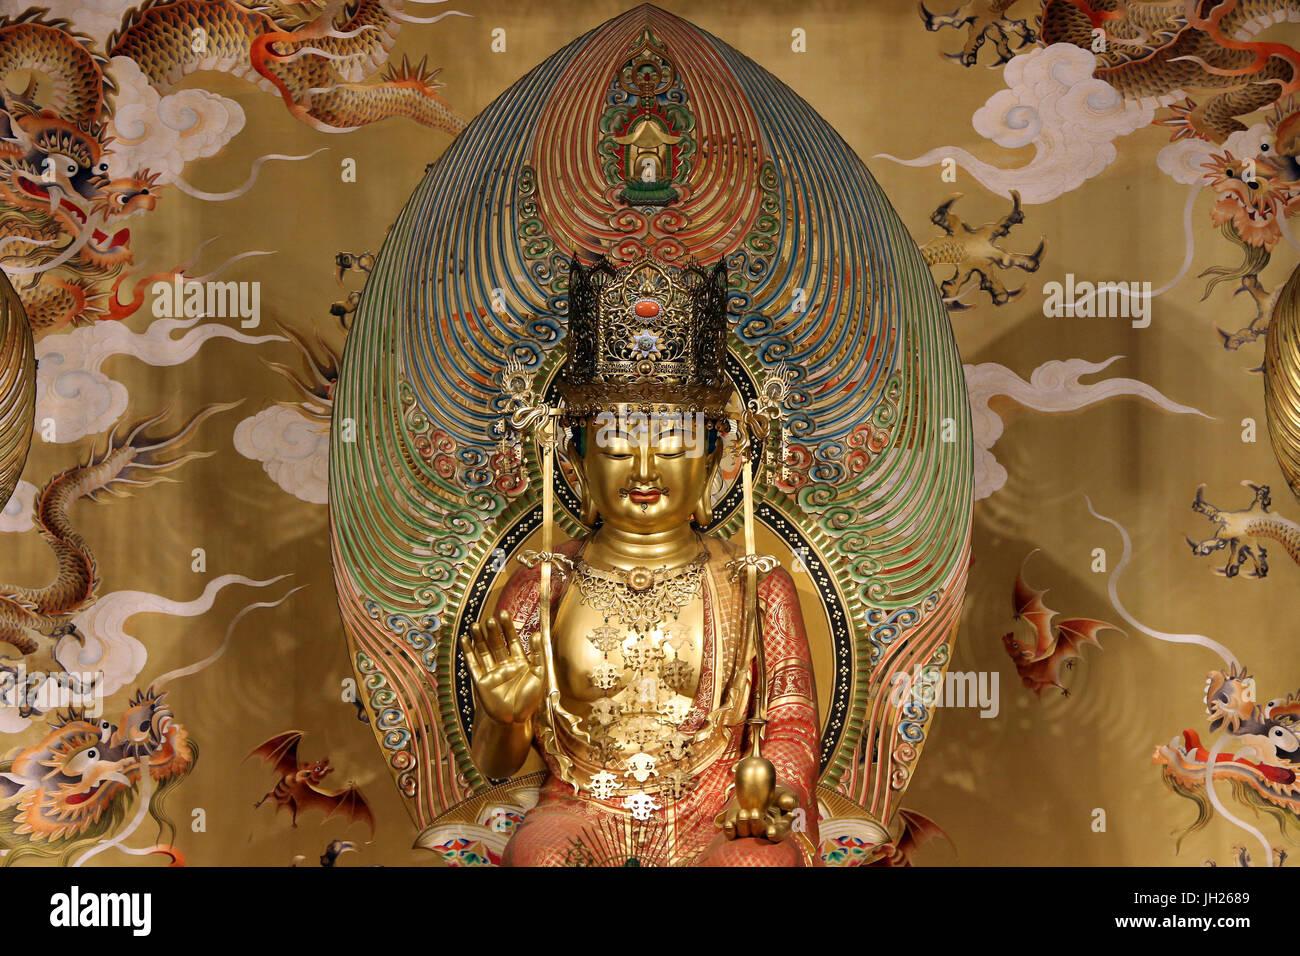 Buddha Tooth Relic Temple in Chinatown. Buddha Maitreya - der zukünftige Buddha.  Singapur. Stockbild